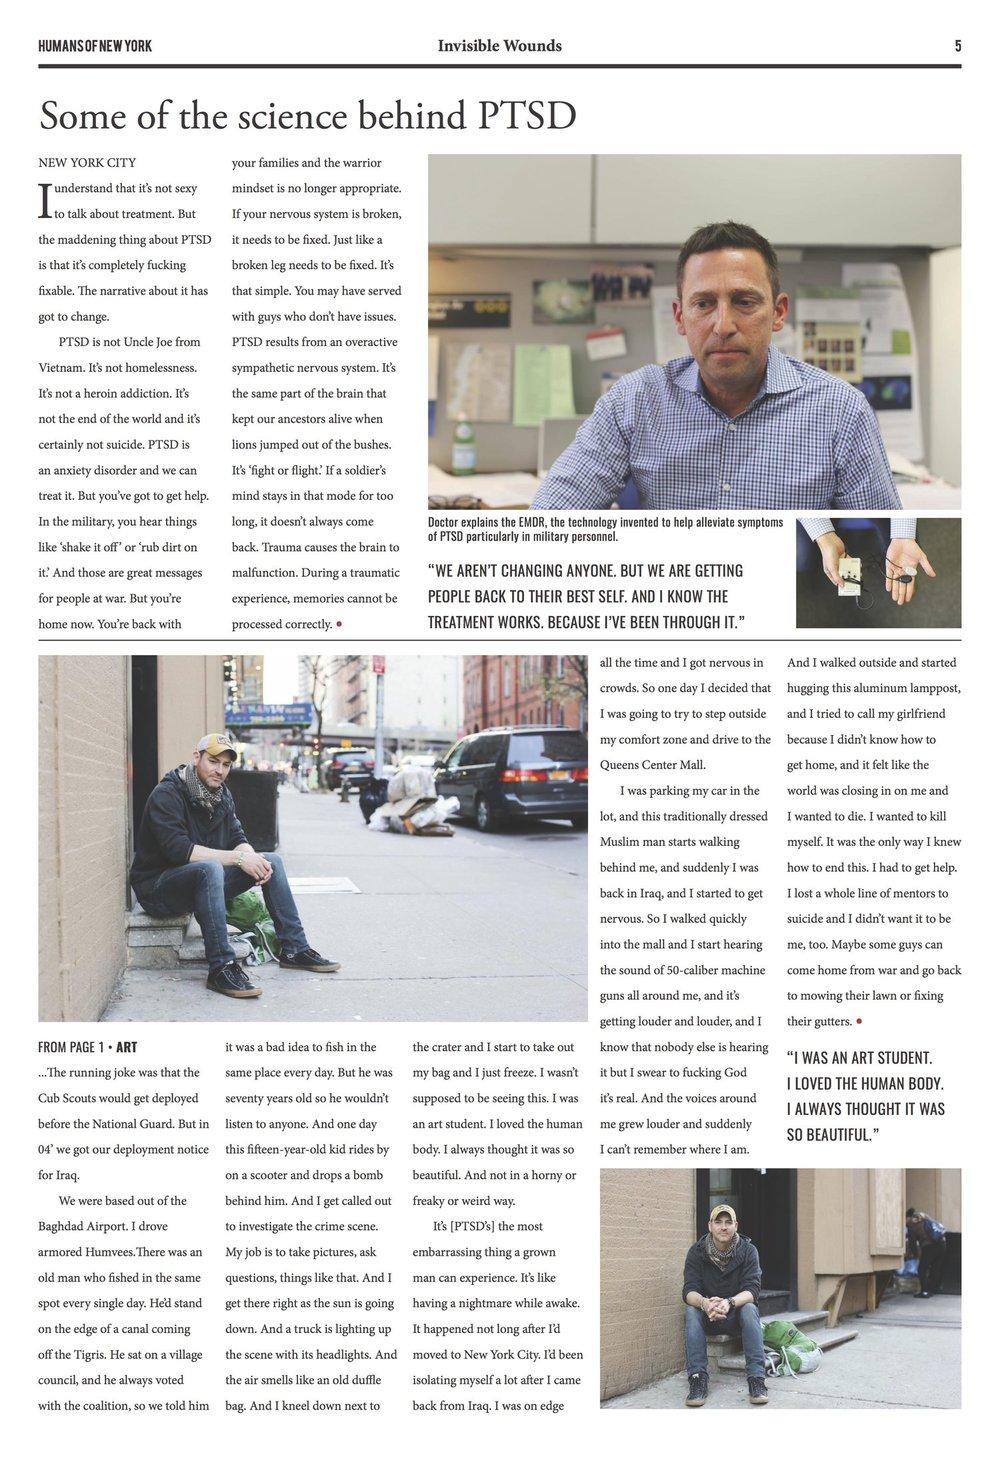 482Bulkeley_HONYNewspaper6pg5.jpg